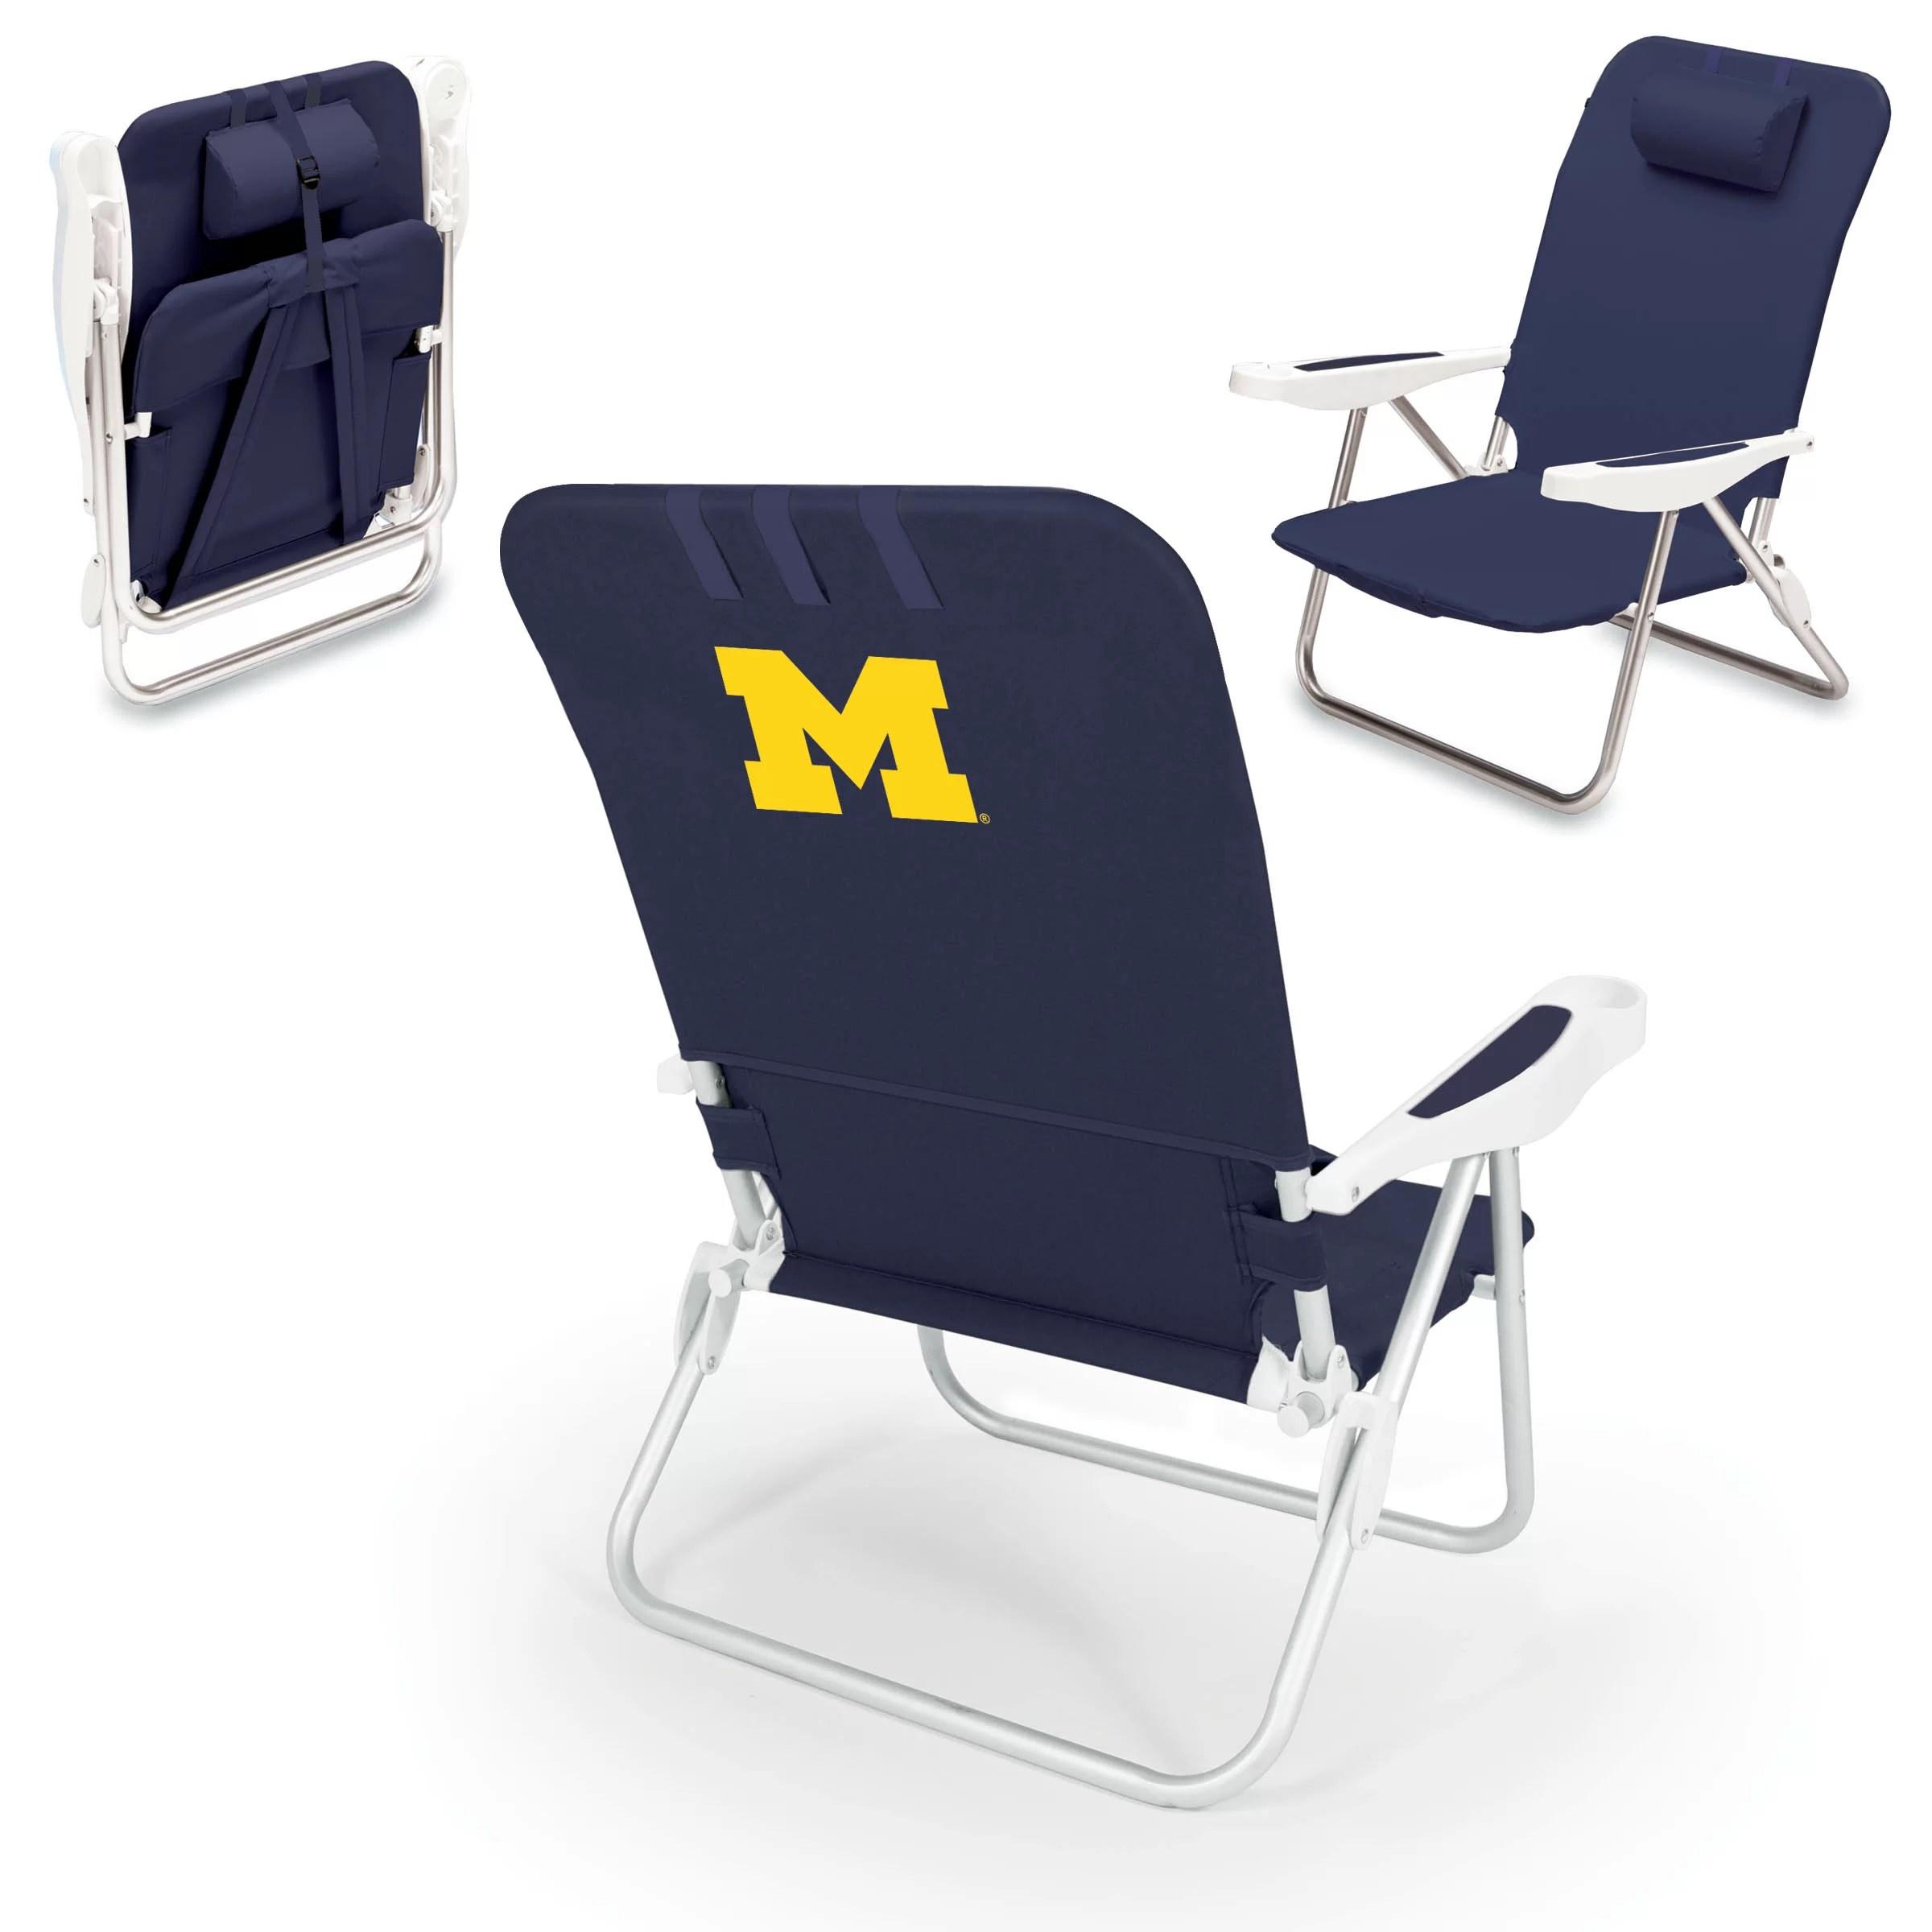 backpack chairs skull chair for sale oniva ncaa monaco reclining beach wayfair